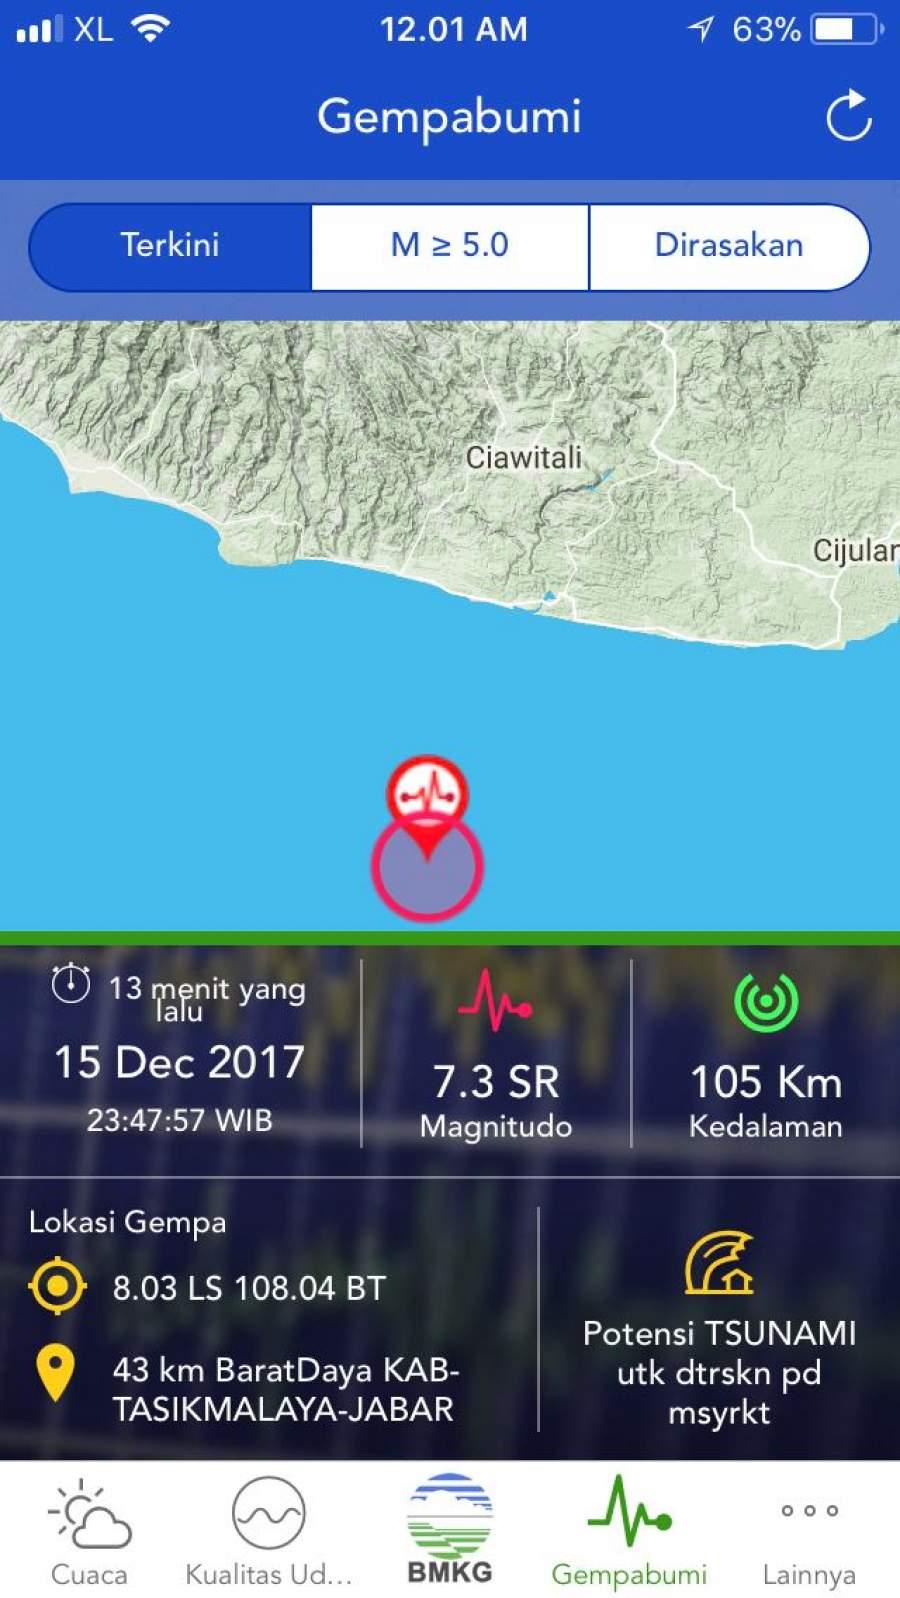 Gempa 6,9 SR, Dua Meninggal Dunia dan Ratusan Rumah Rusak